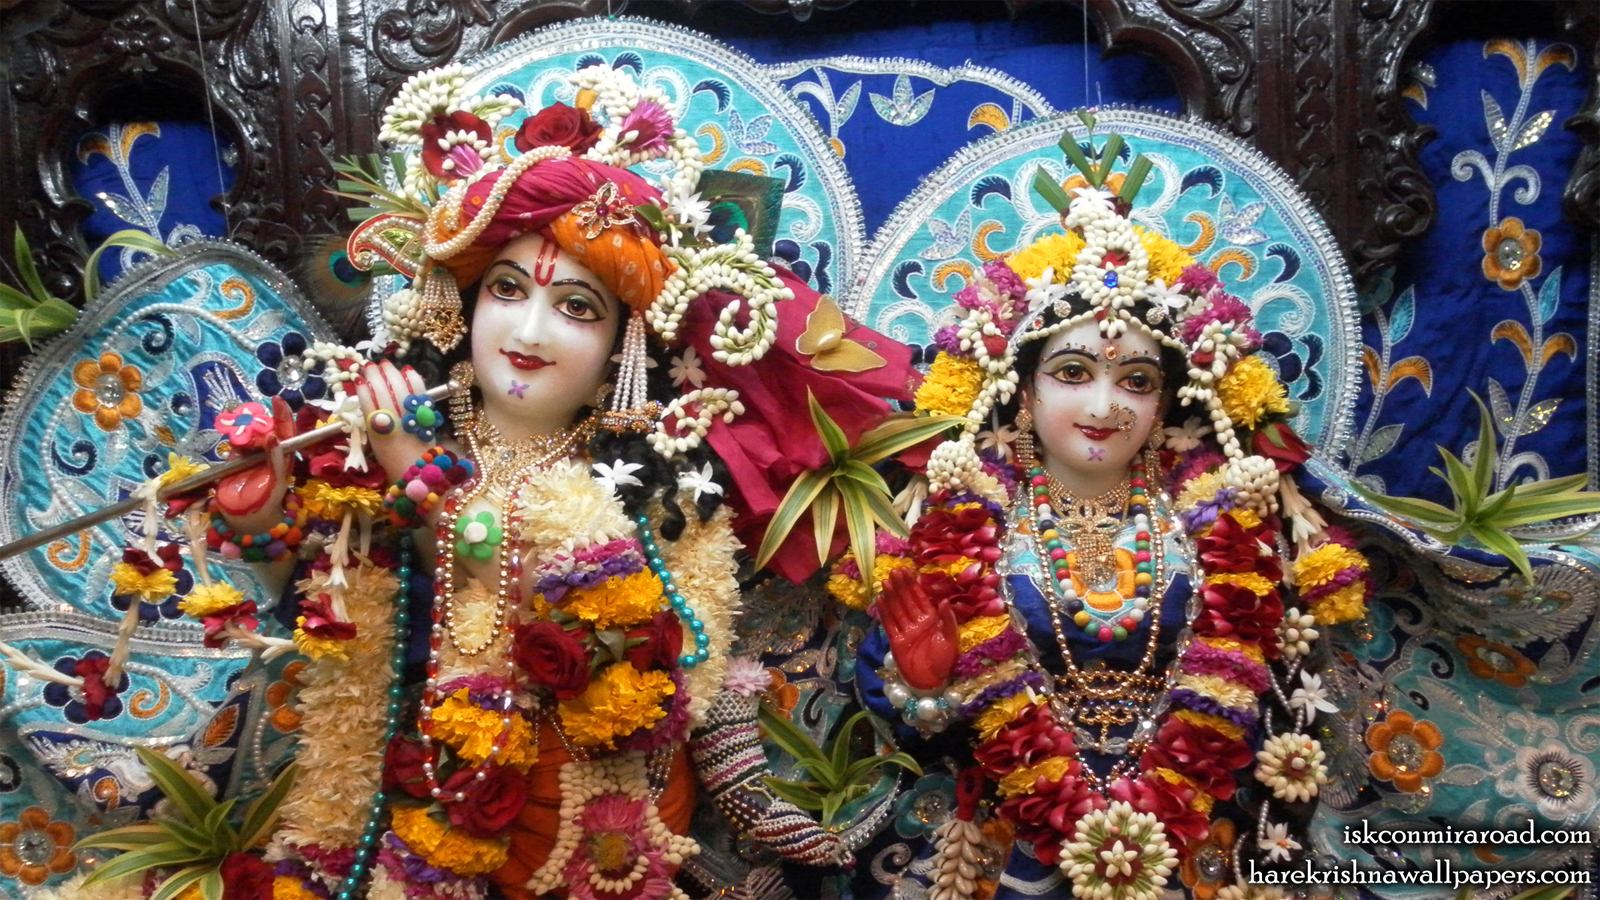 Sri Sri Radha Giridhari Close up Wallpaper (018) Size 1600x900 Download